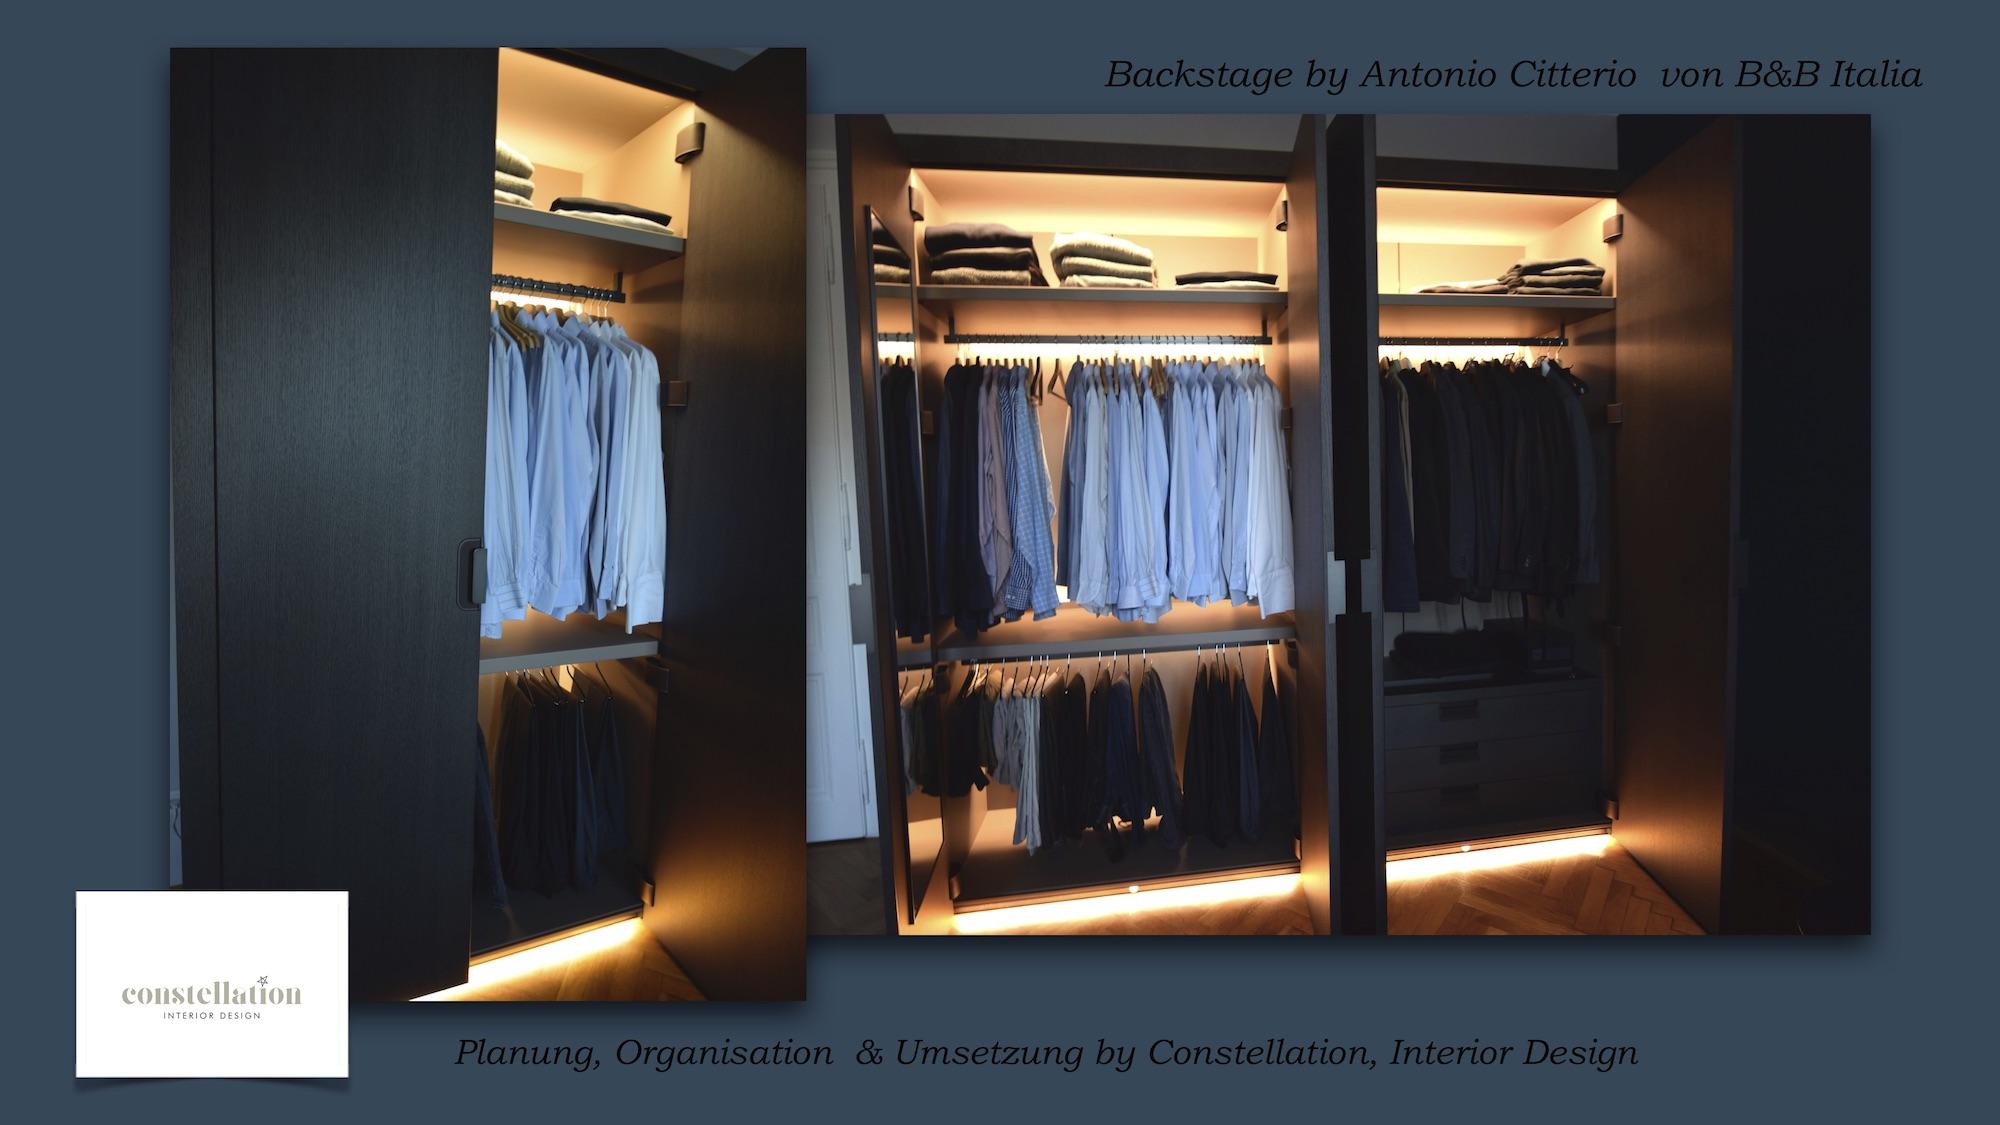 Planung Realisierung Umsetzung Projekt Kleiderkasten Closet Backstage B&B Italia